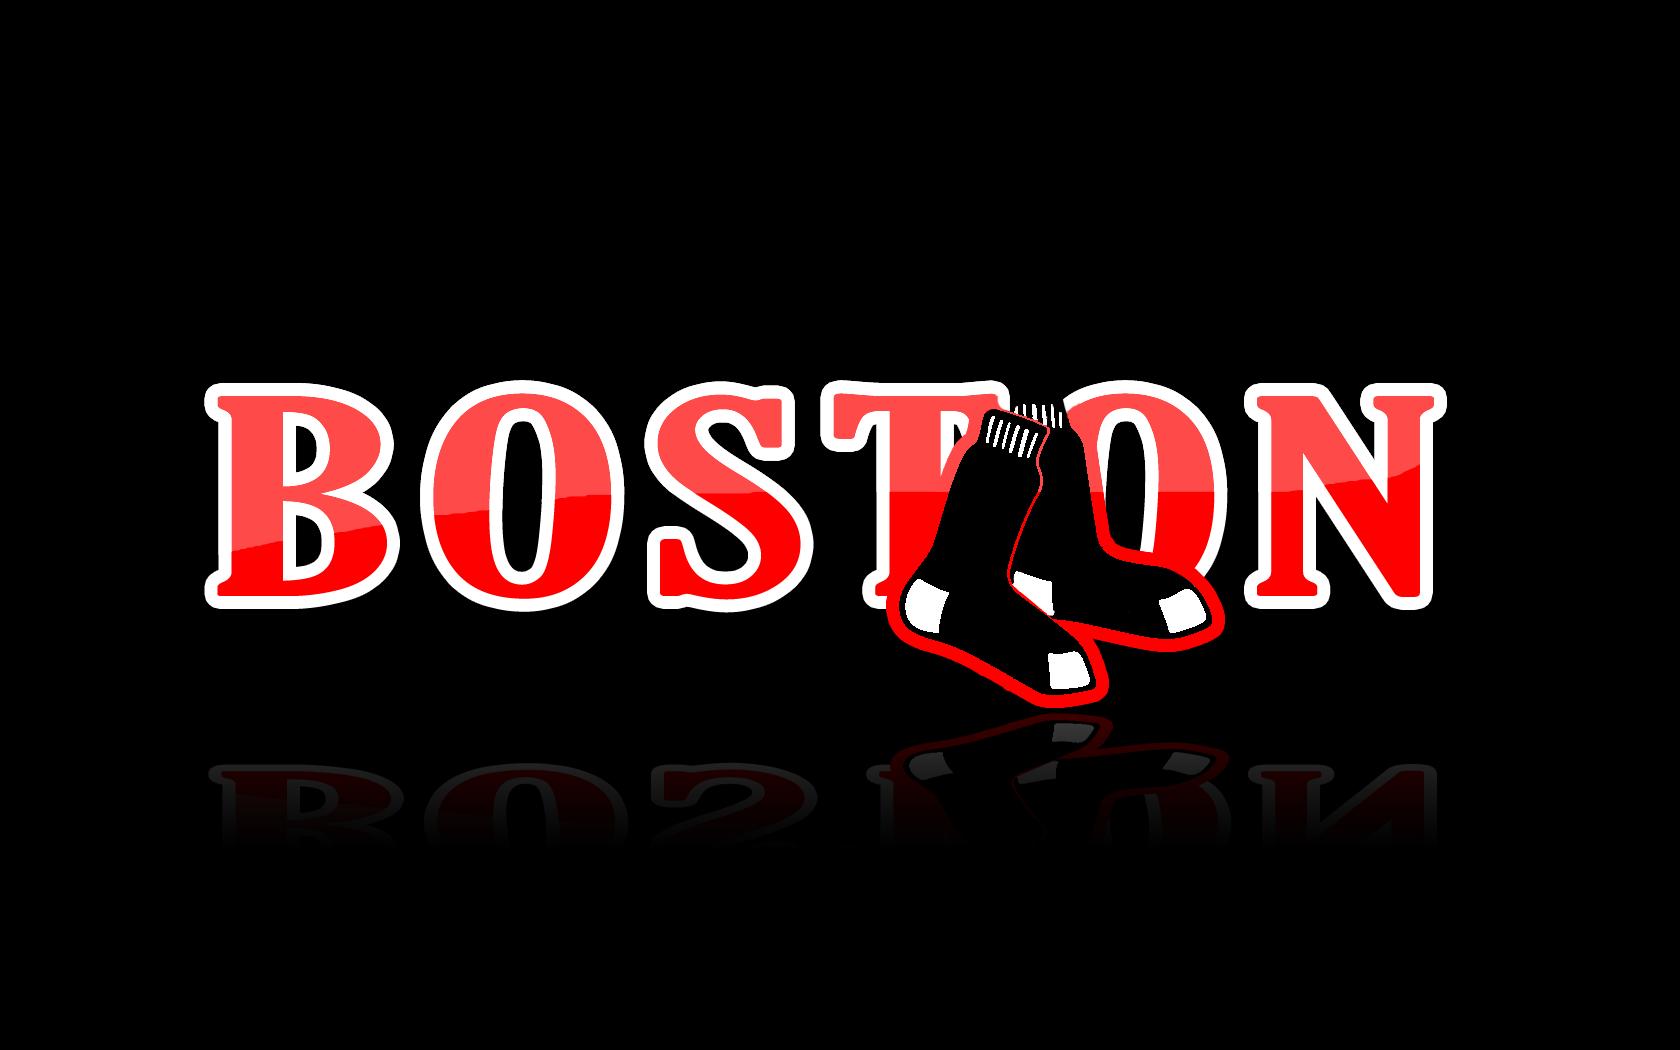 Dark Red Sox By Agentborrelli Deviantart Com On Deviantart Boston Red Sox Wallpaper Red Sox Wallpaper Boston Red Sox